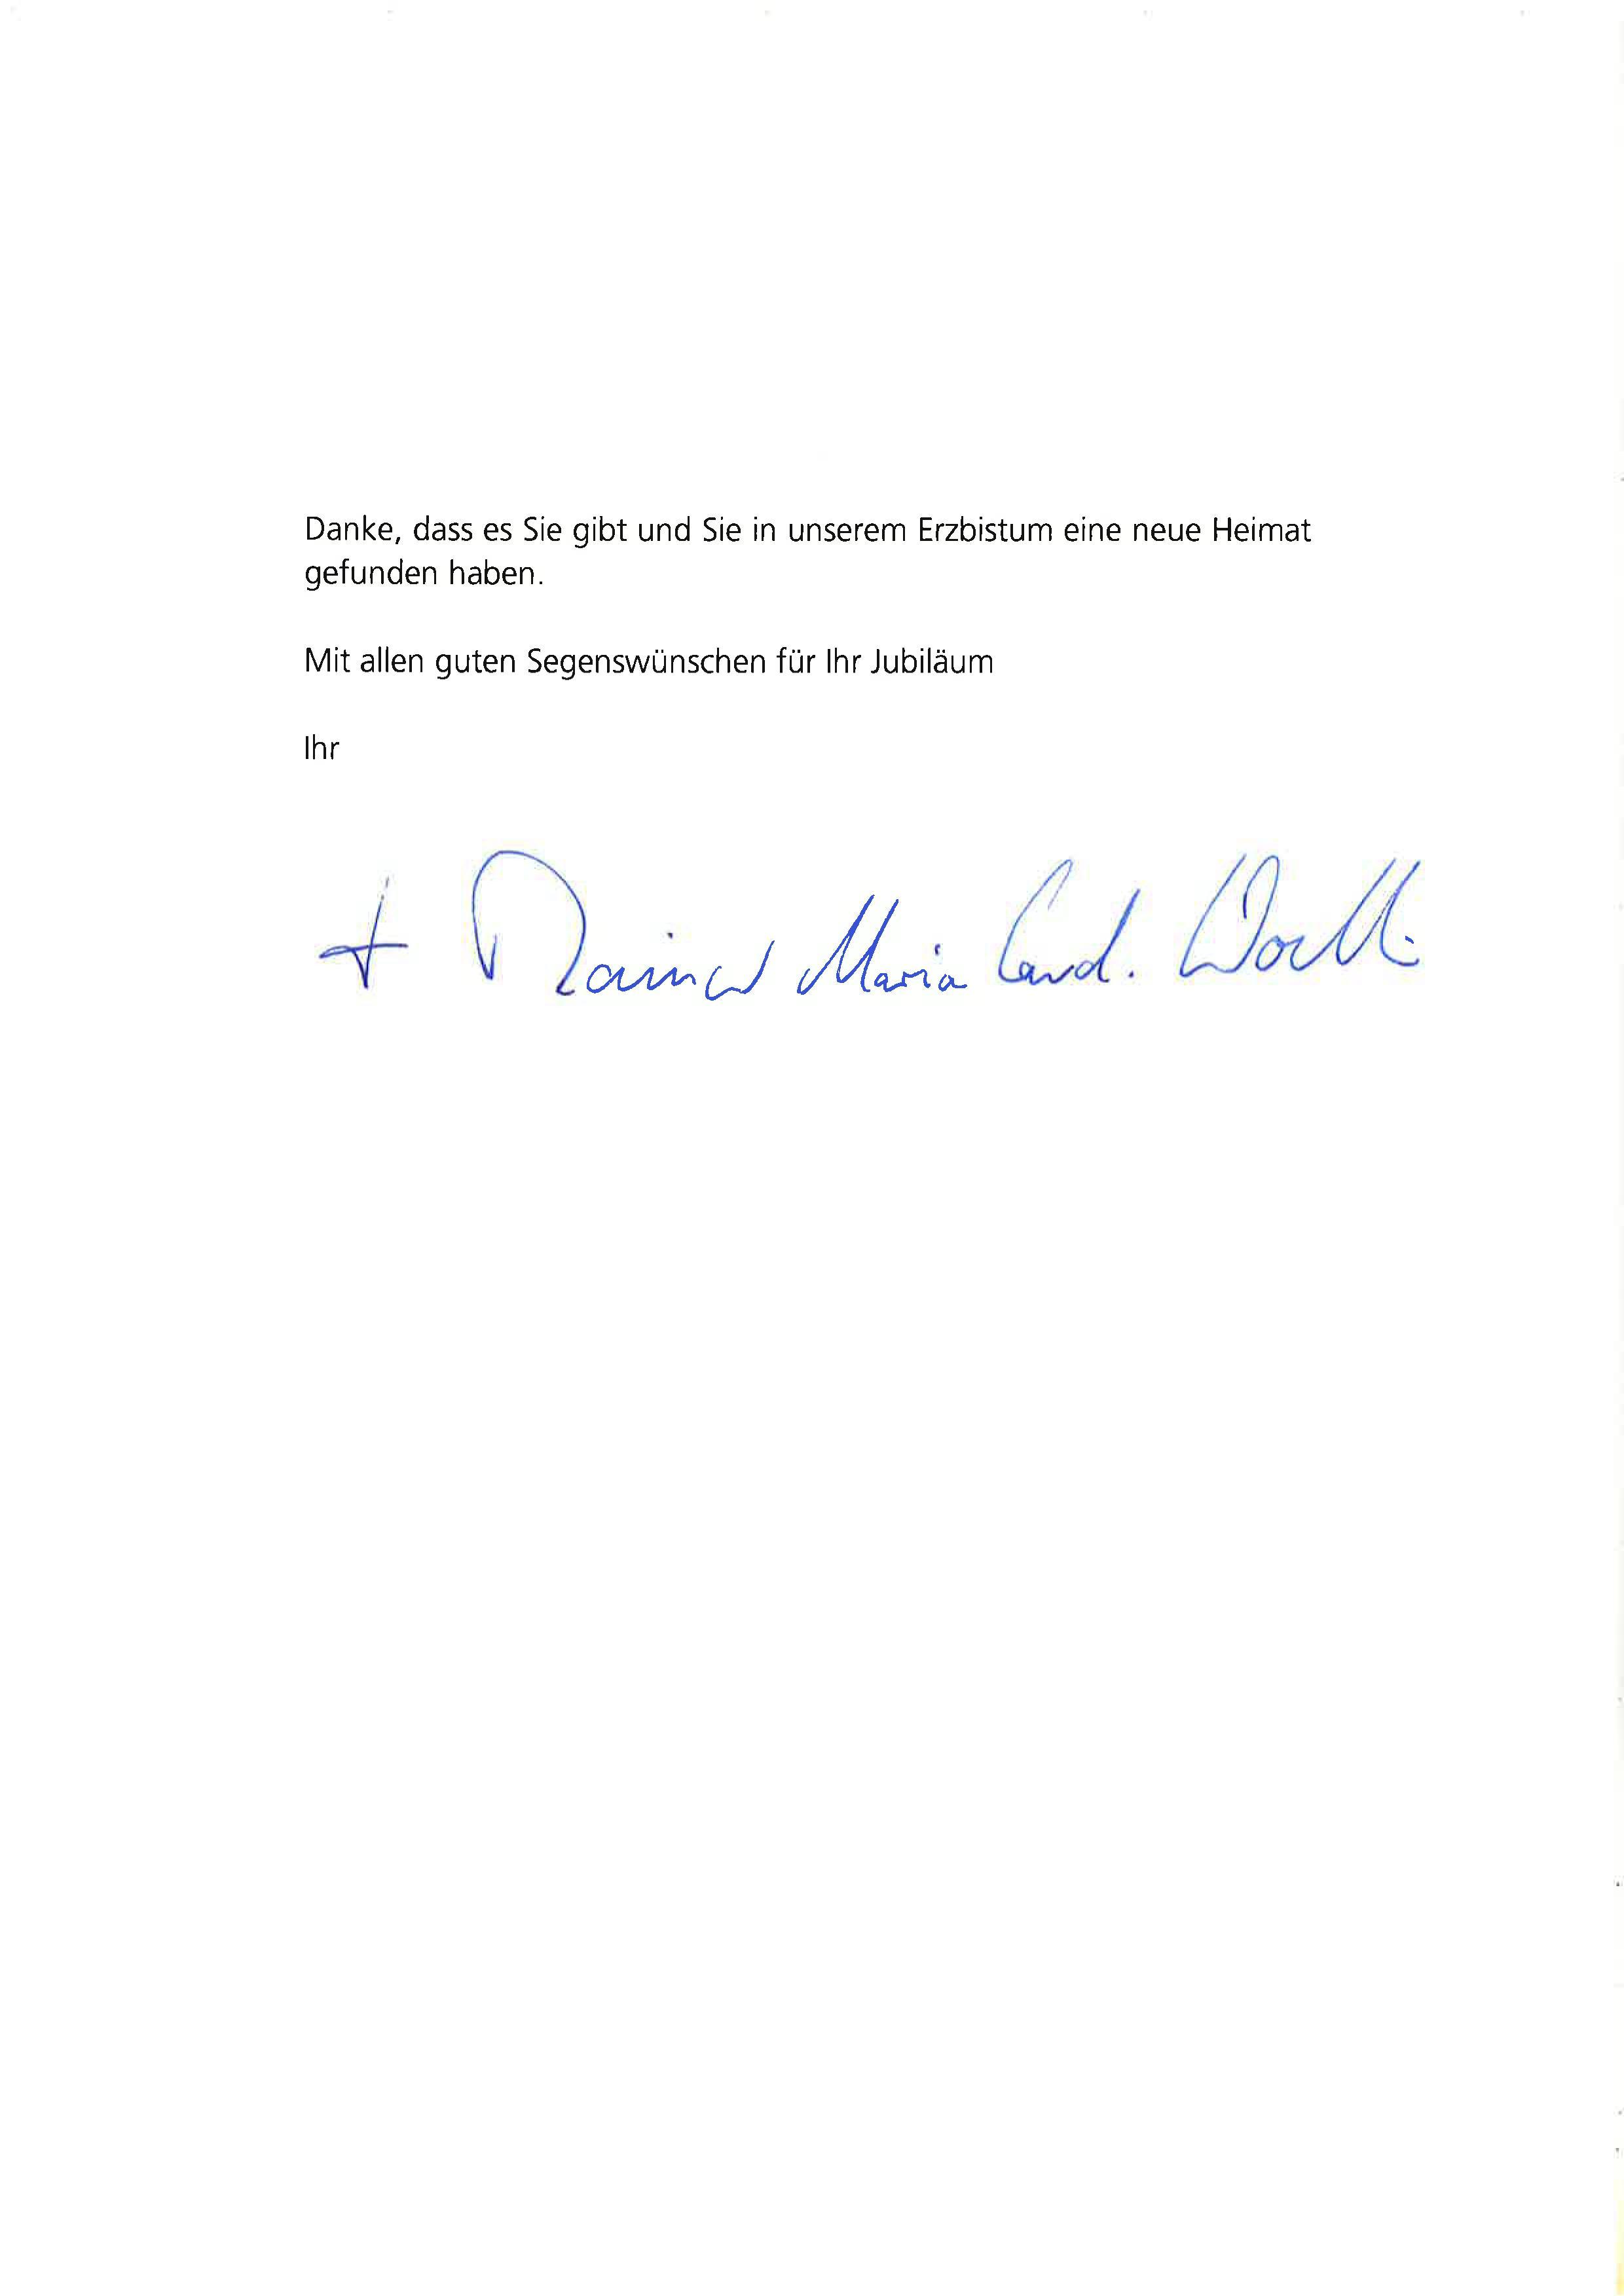 Grußwort Kardinal Rainer Maria Woelki_03